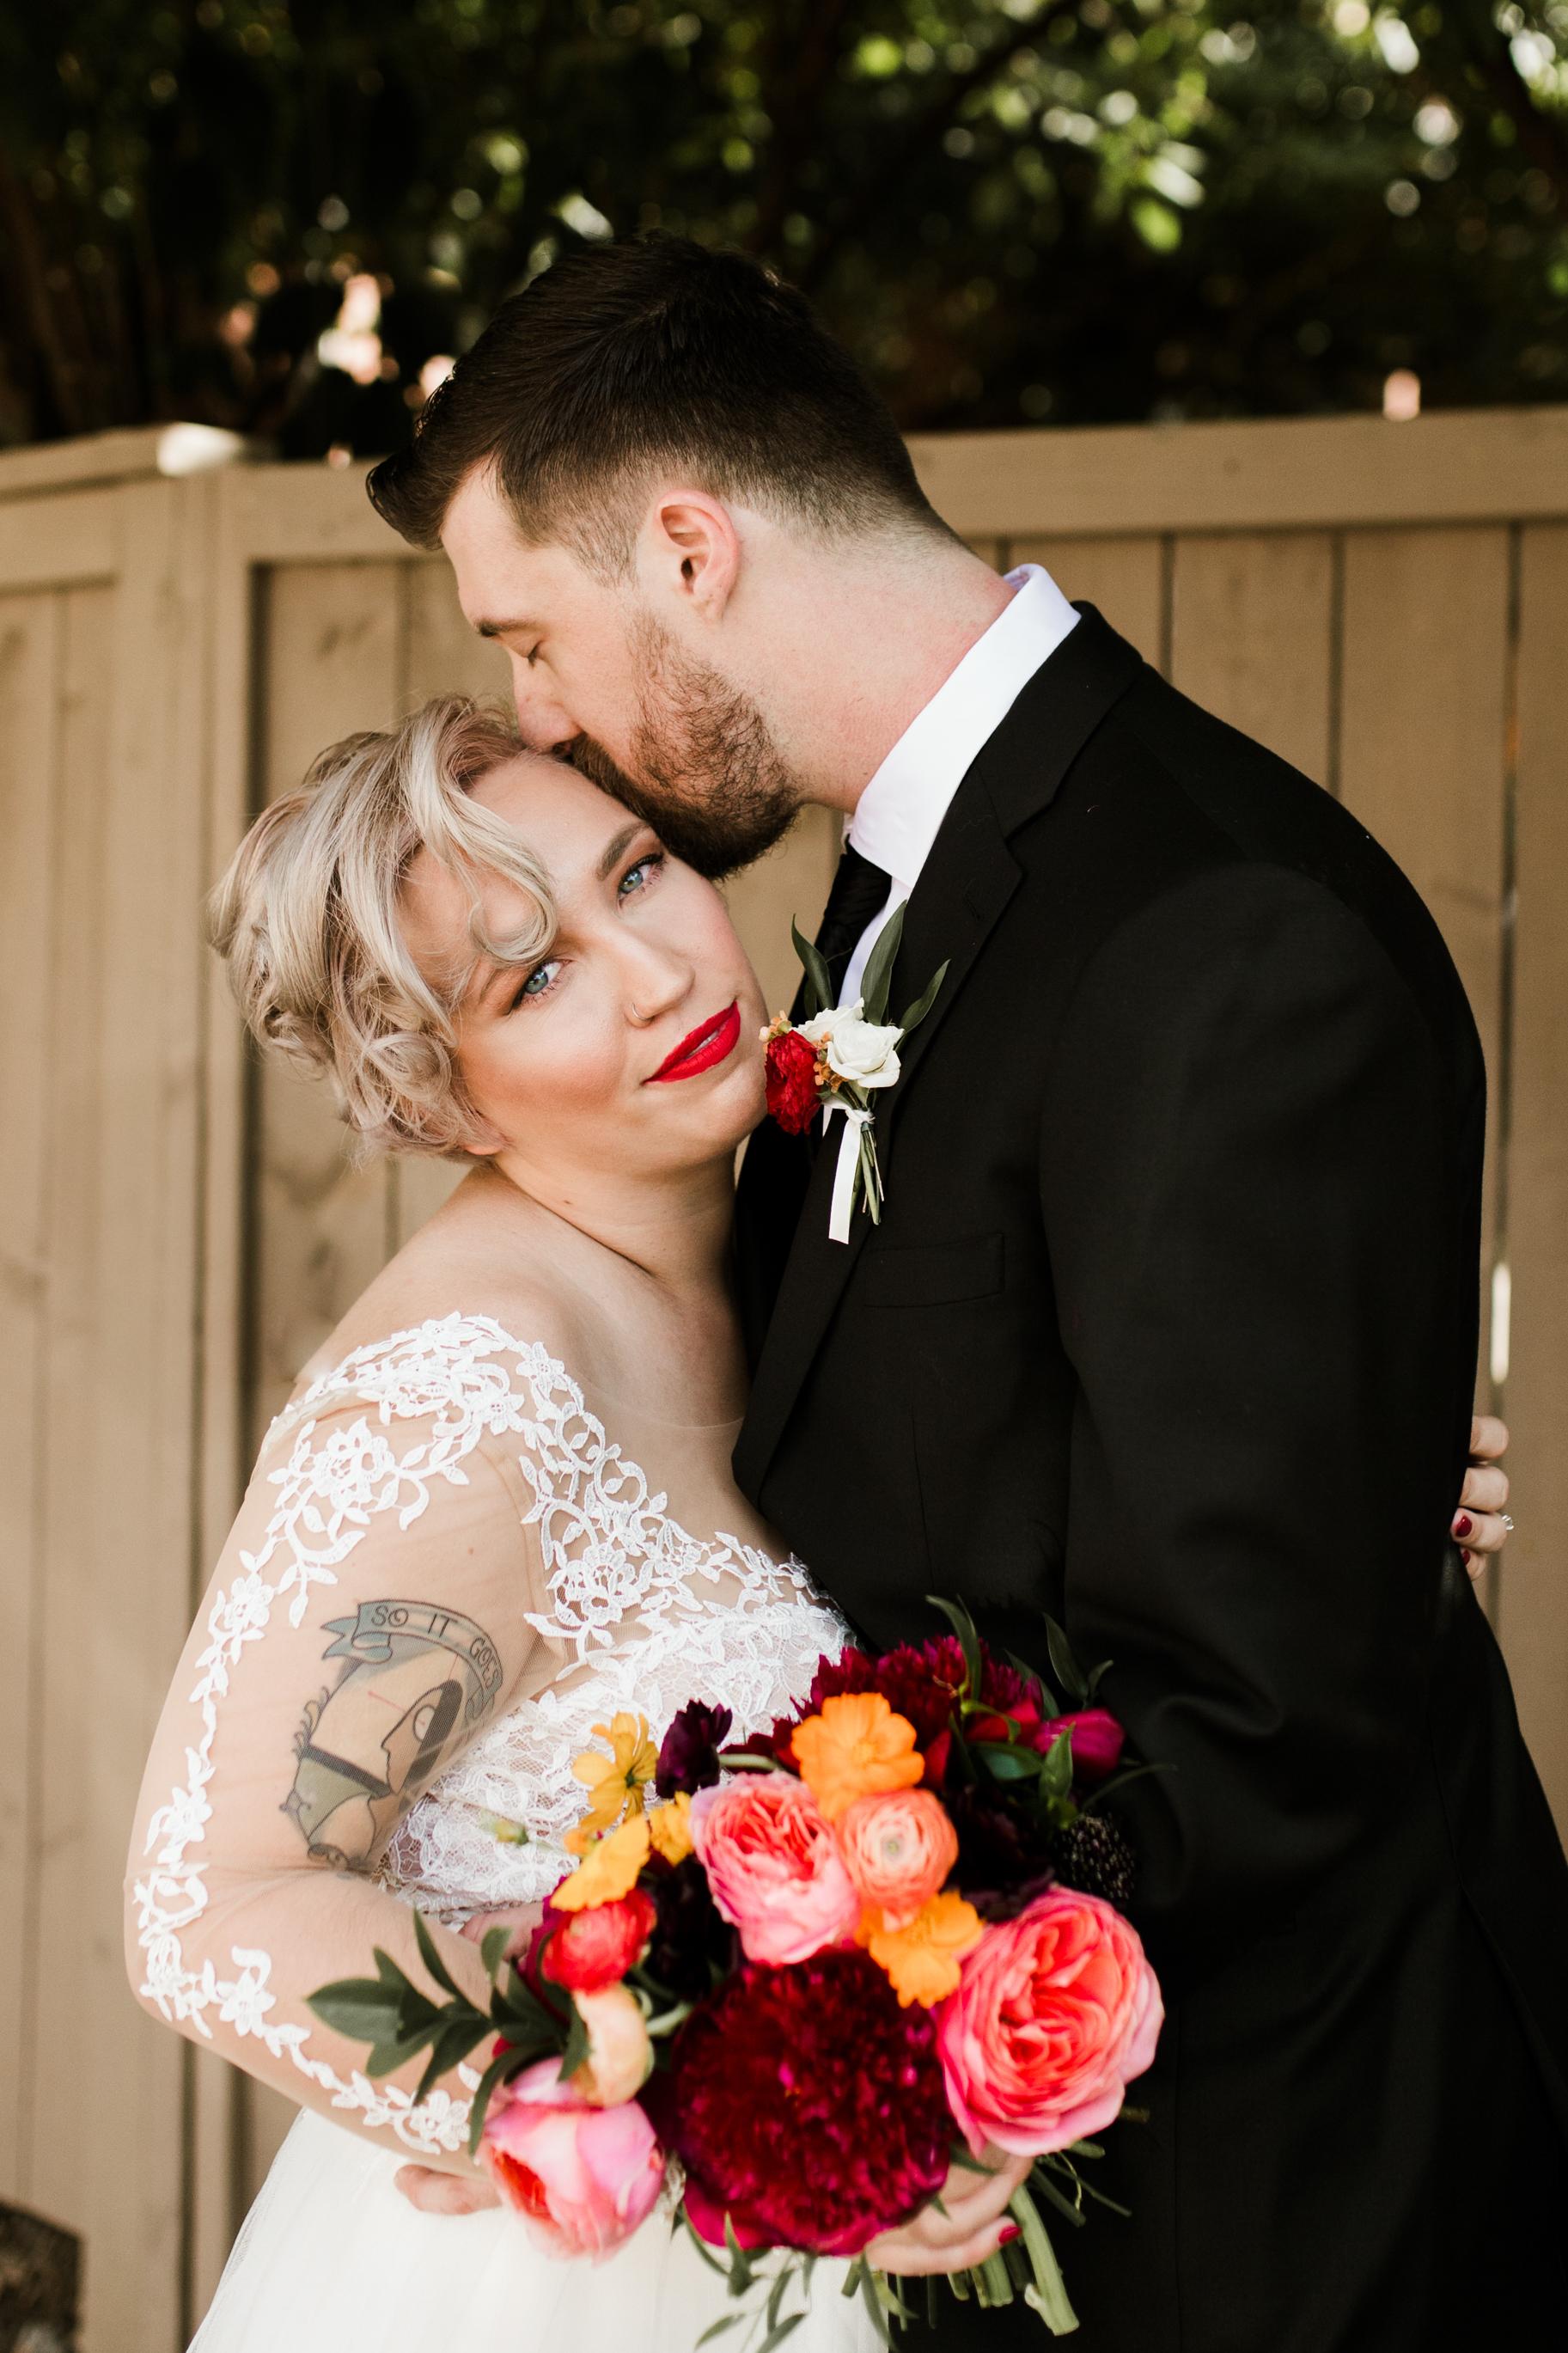 Kentucky Wedding Louisville Wedding Photographer 2018 Crystal Ludwick Photo Louisville Wedding Photographer Kentucky Wedding Photographer (3 of 105).jpg